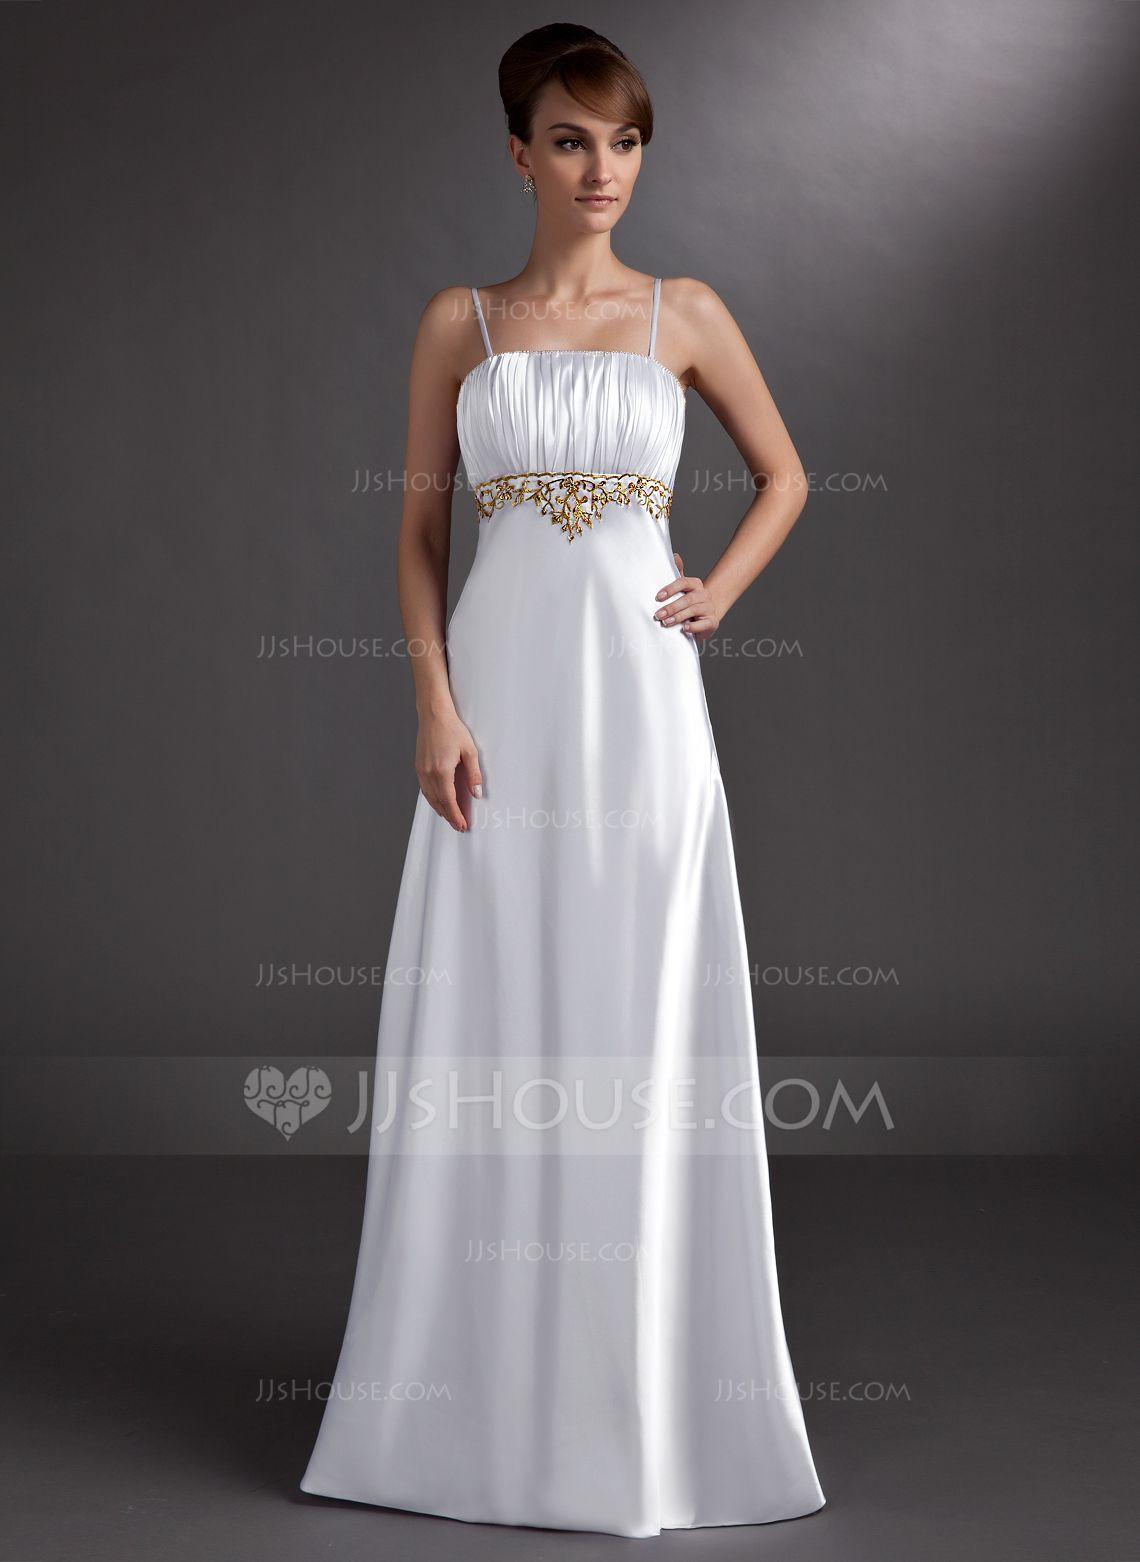 CEEWHY Abendkleider Dubai Evening Dress Floor Length